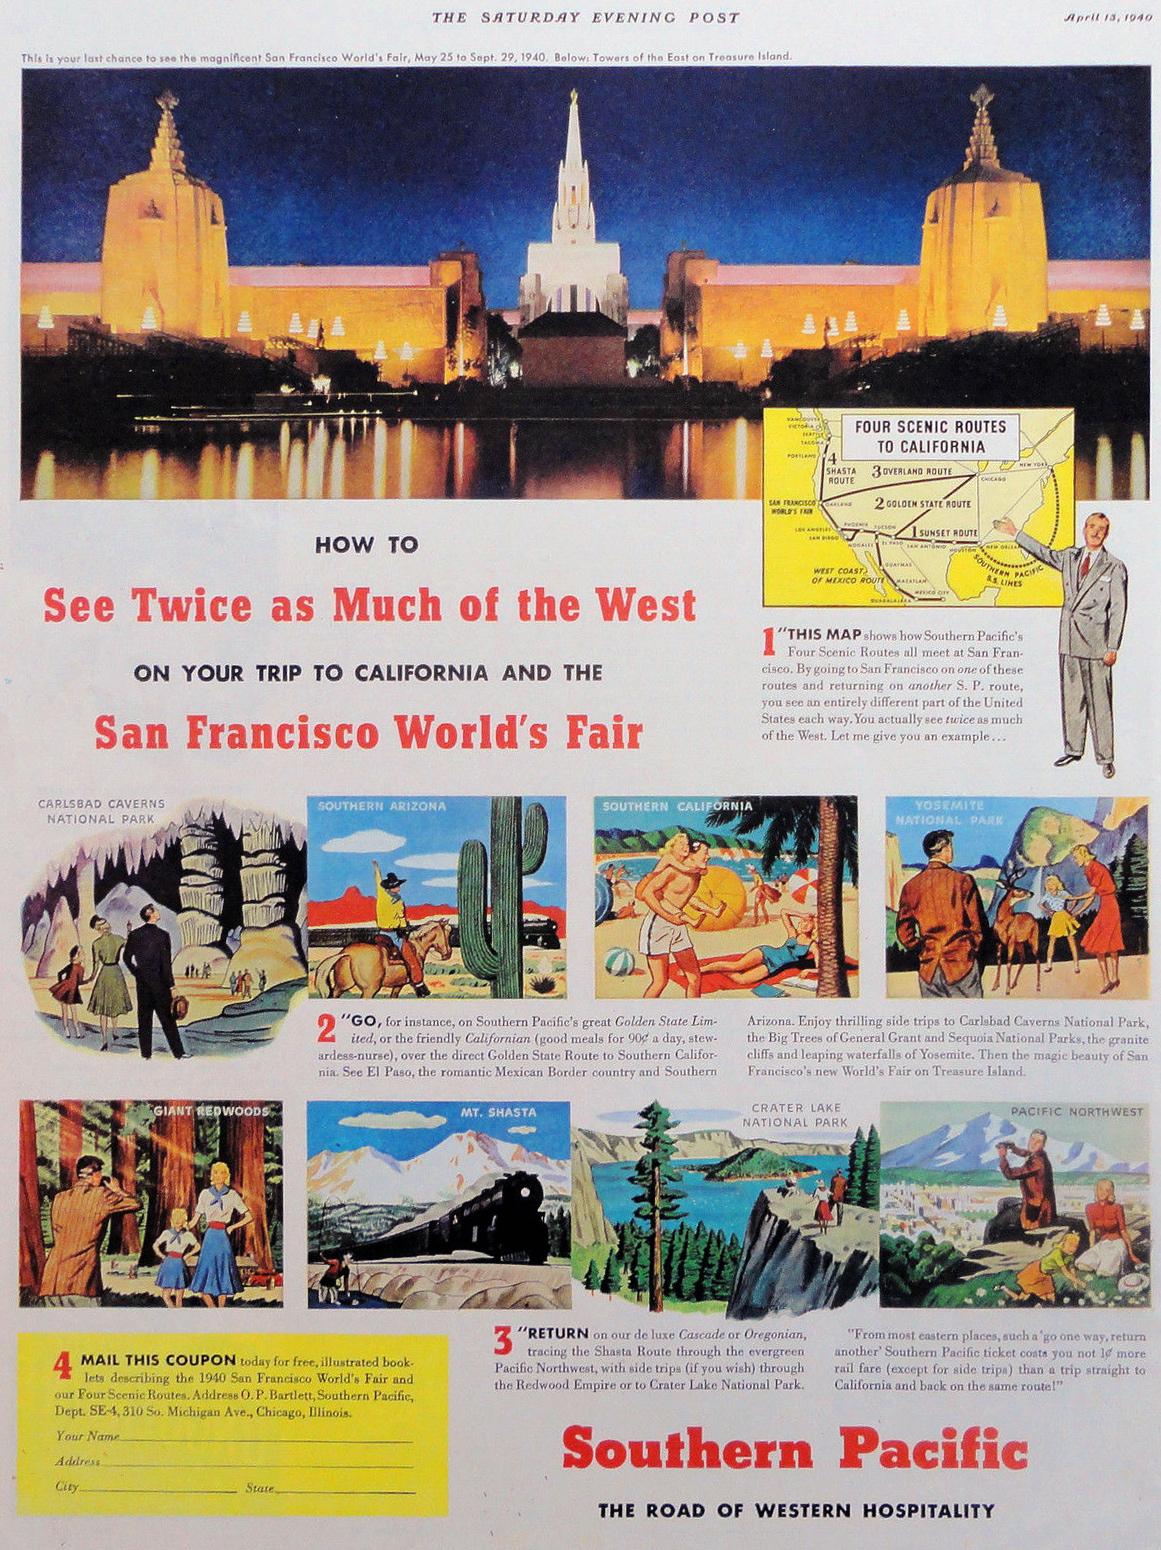 The San Francisco World's Fair